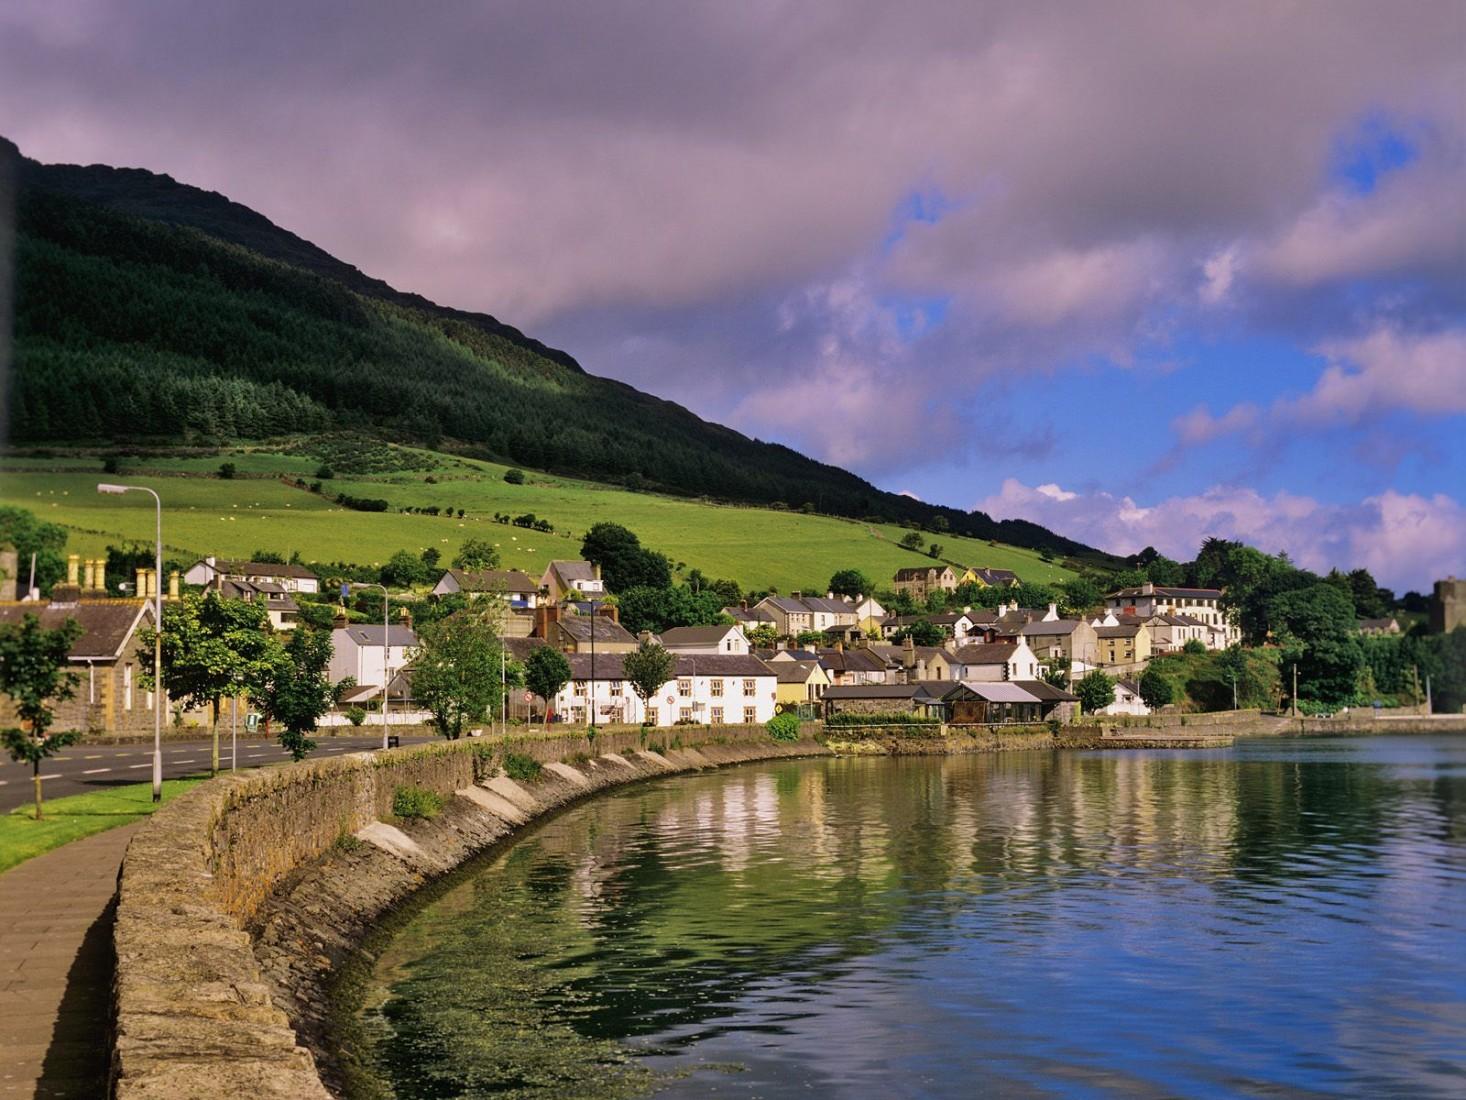 Carlingford__Cooley_Peninsula__County_Louth__Ireland